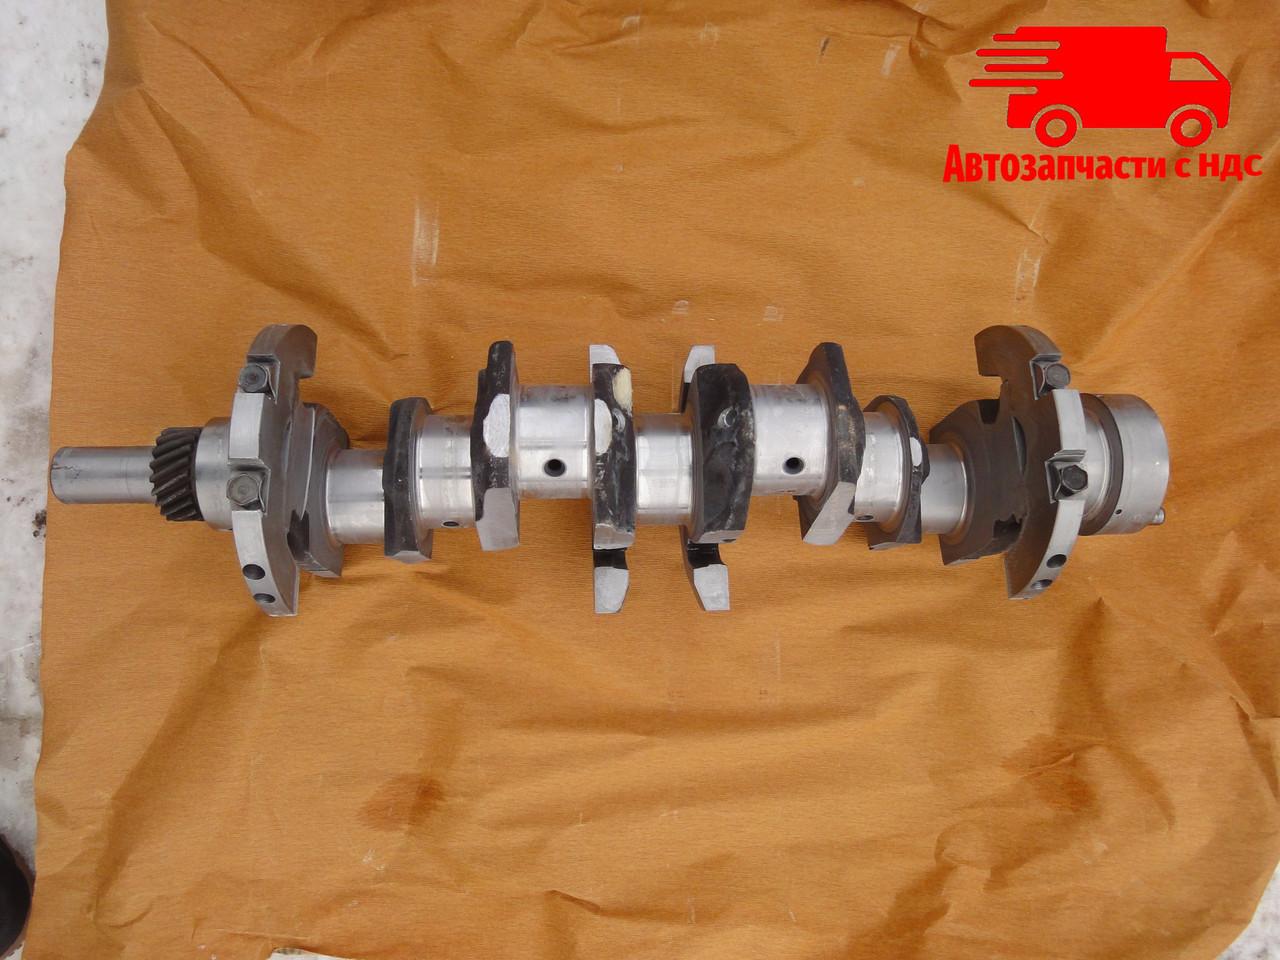 Вал коленчатый МТЗ 80, 82 двигатель Д 245.7, 9, Е2  (пр-во ММЗ). Ціна з ПДВ